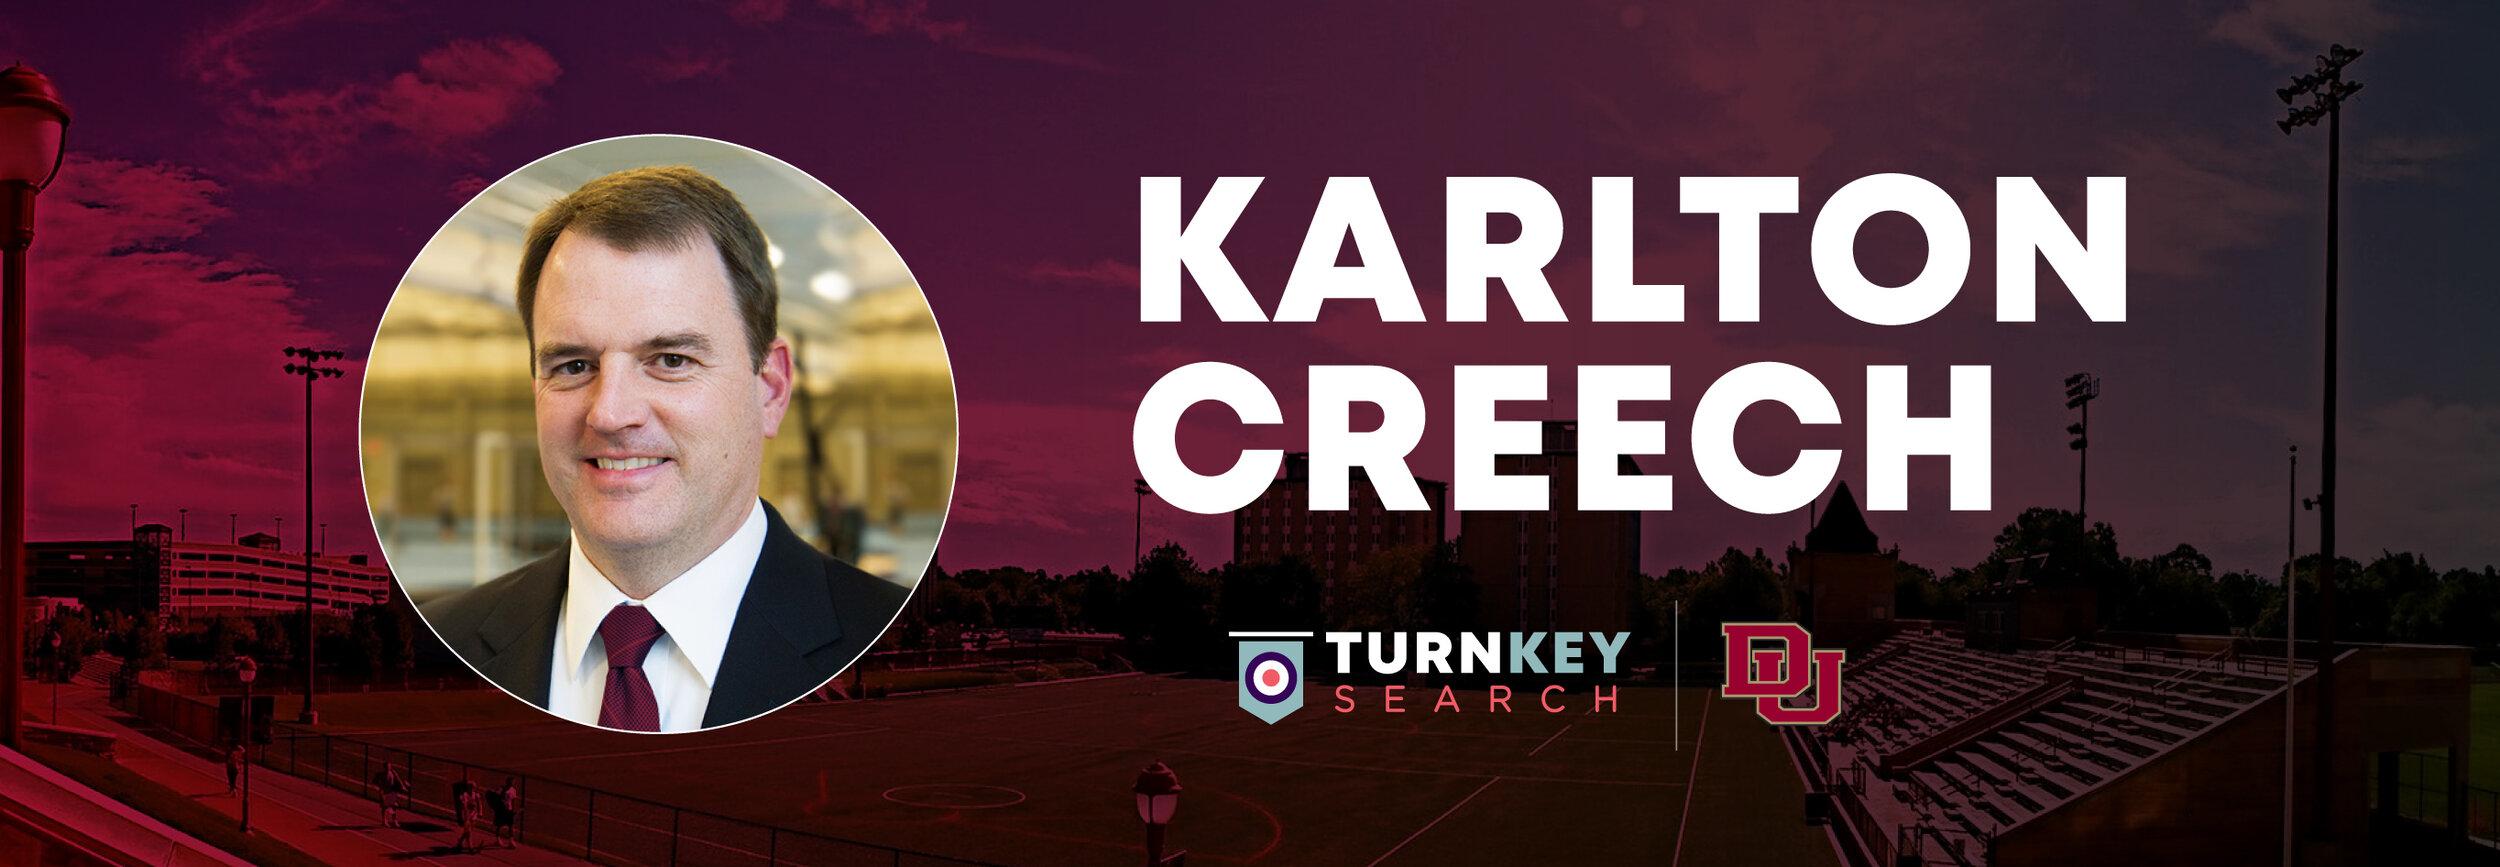 University-of-Denver-Karlton-Creech-Turnkey Search.jpg